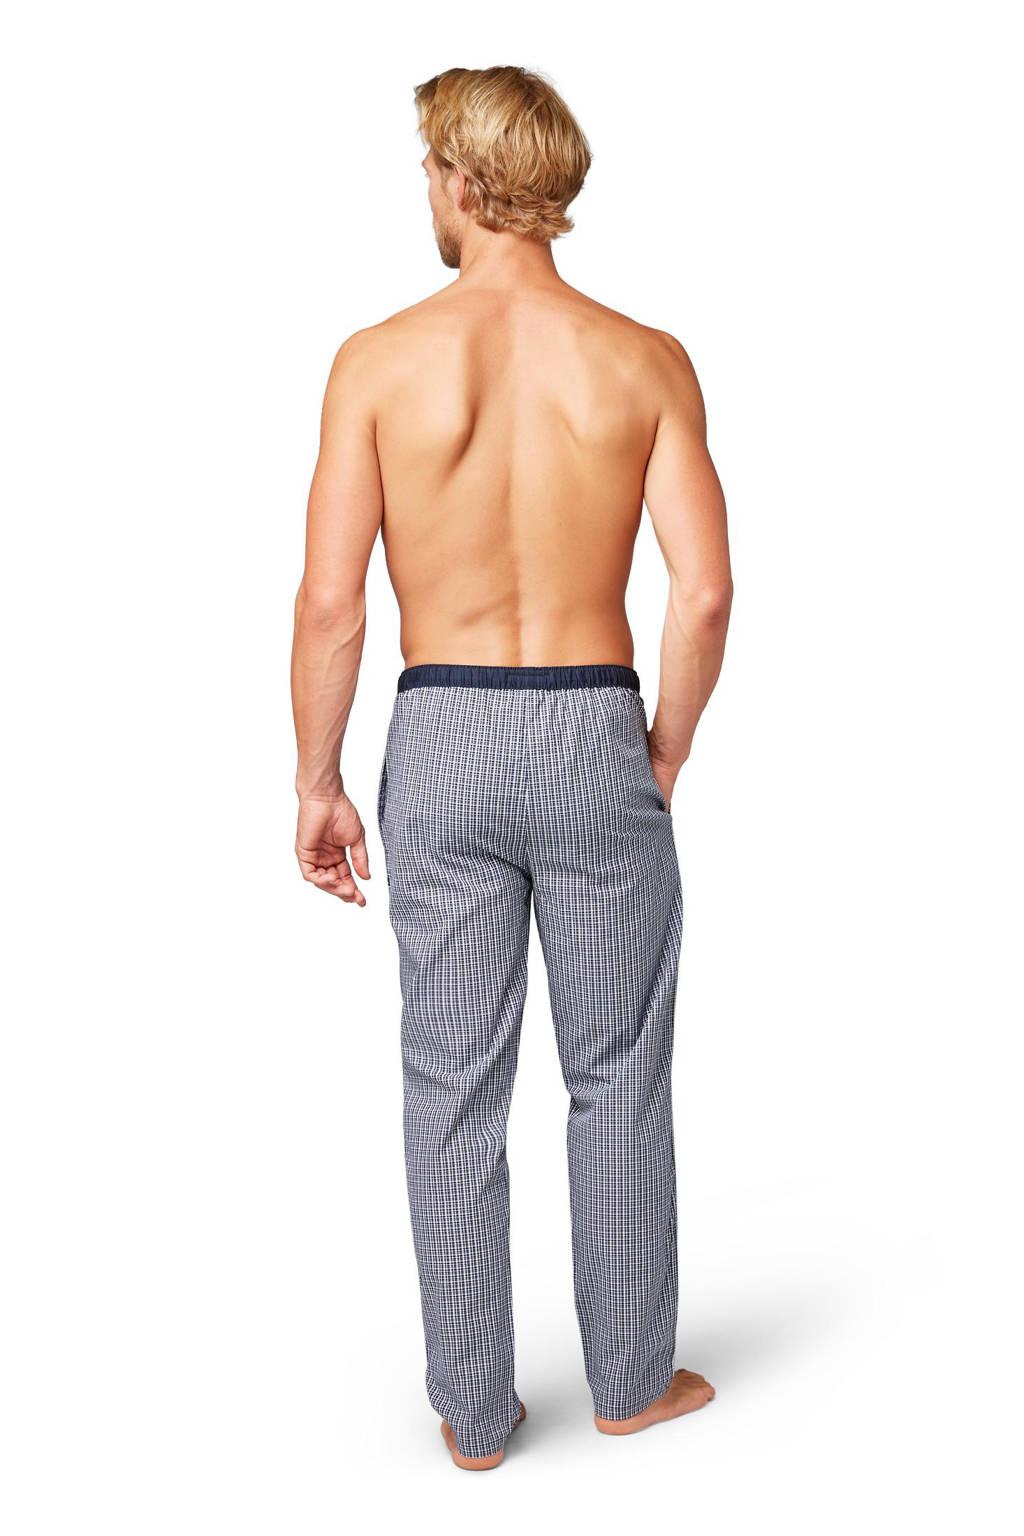 Tom Tailor geruite pyjamabroek donkerblauw/wit, Donkerblauw